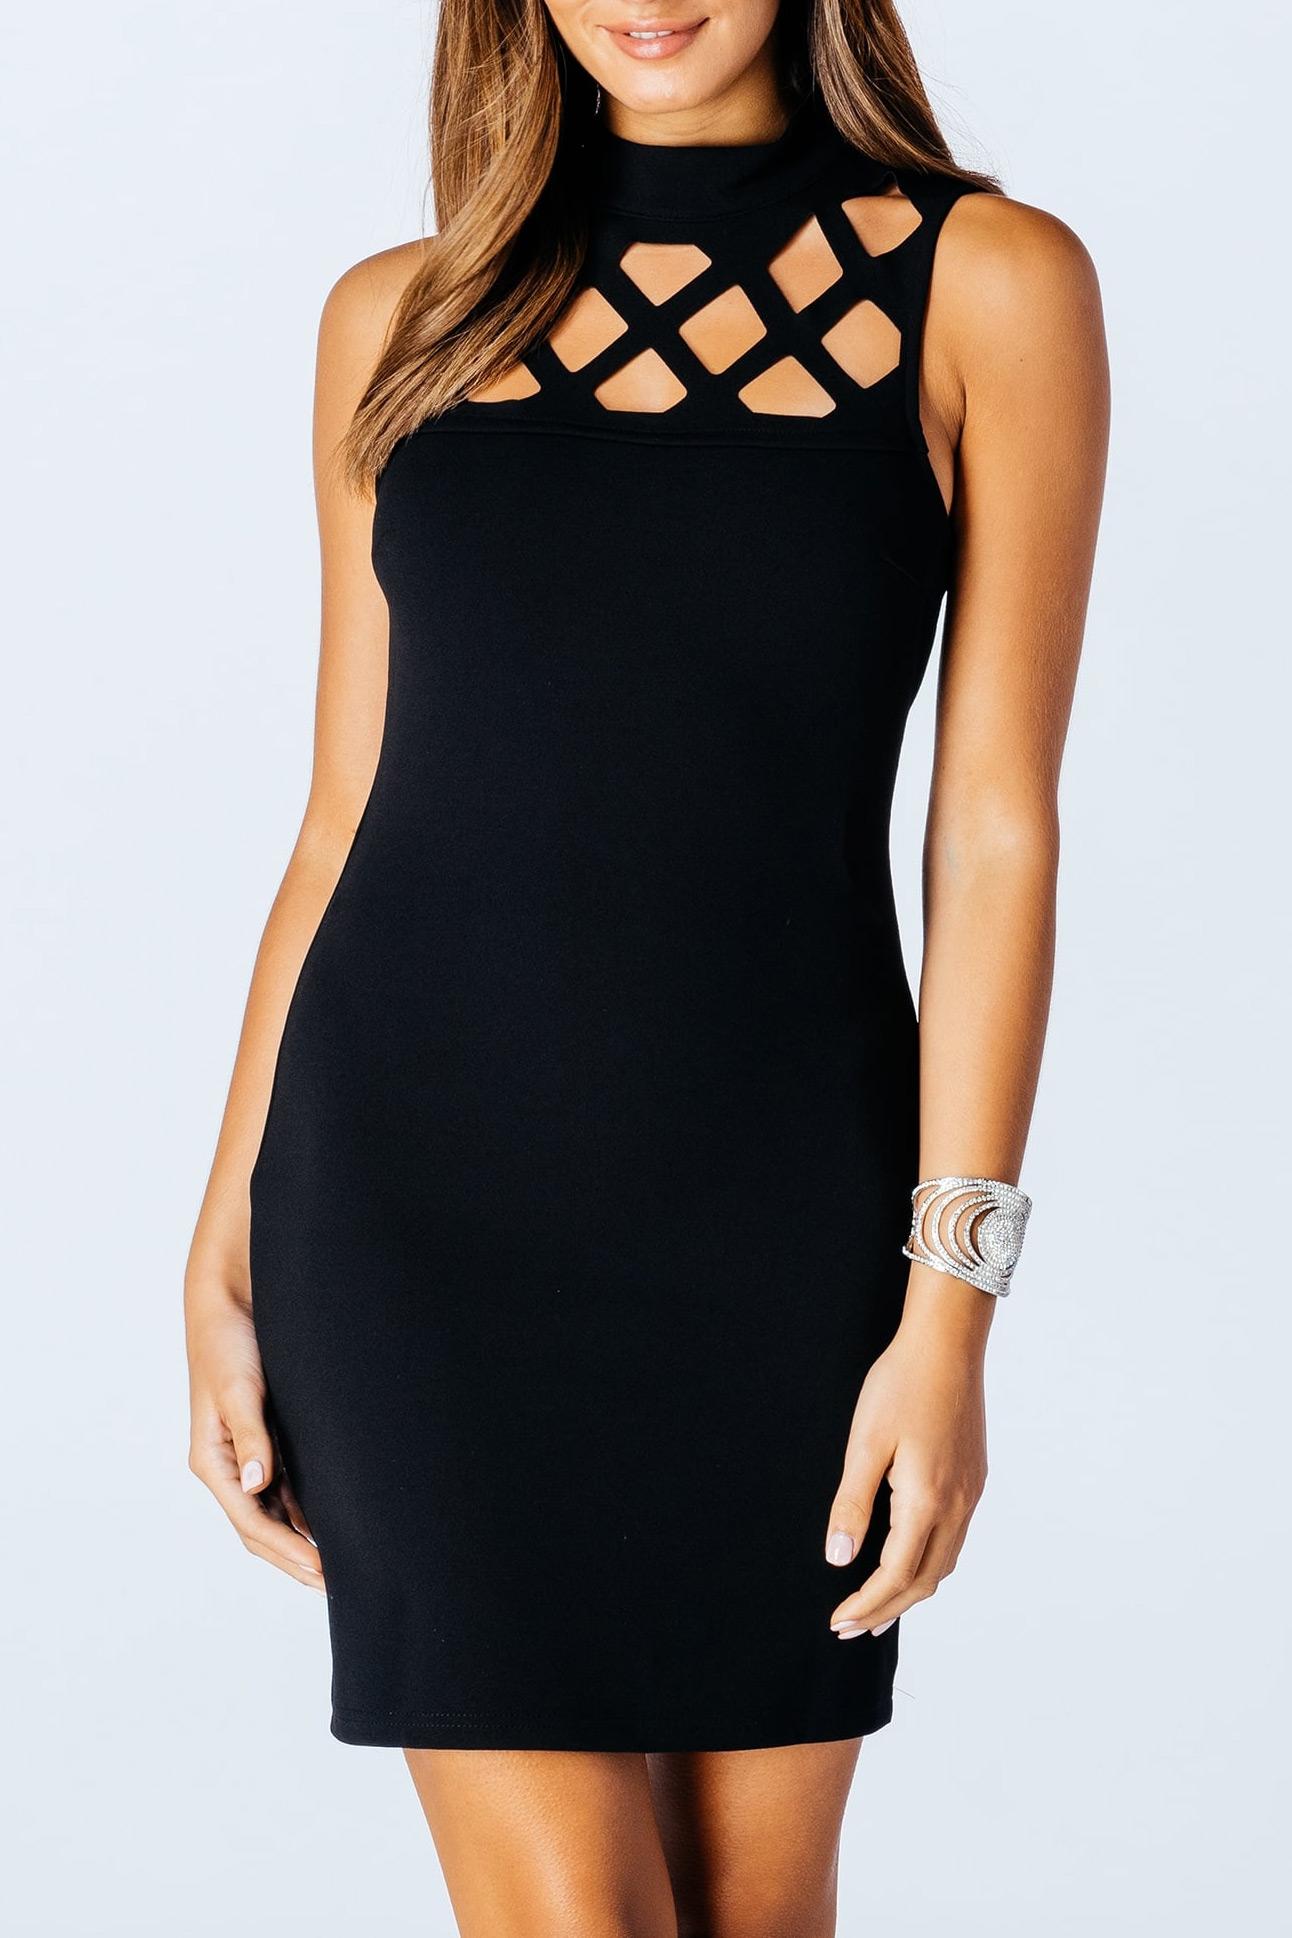 Mini φόρεμα με κοψίματα σε ντεκολτέ και πλάτη